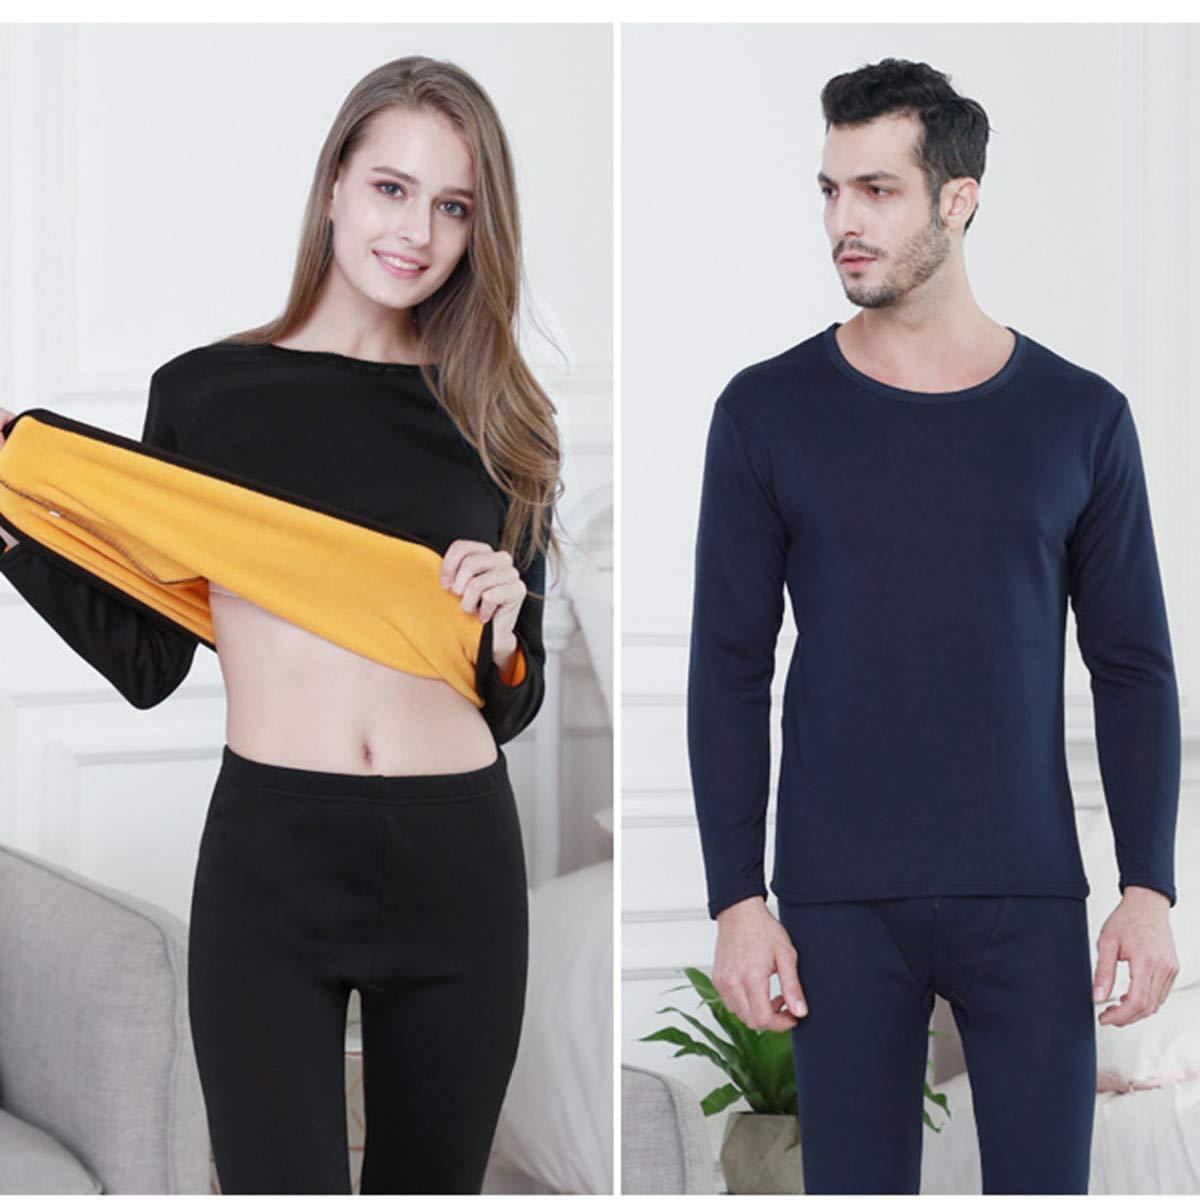 Unisex Thermal Underwear Fleece Lined Winter Base Layering Set